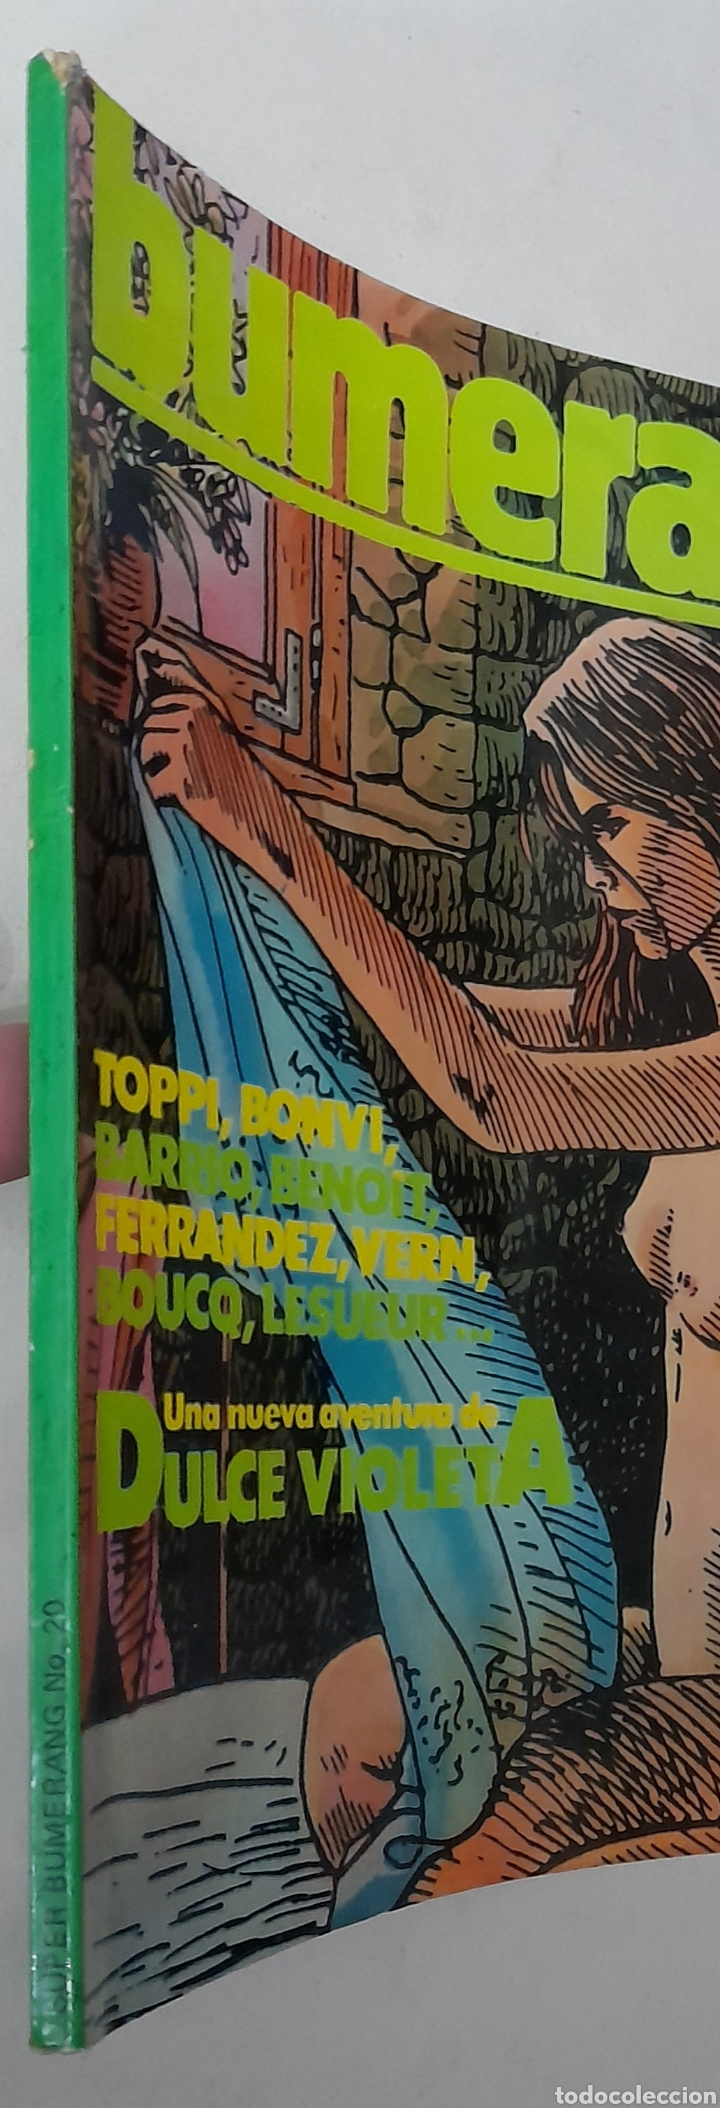 Cómics: SUPER BUMERANG. No. 20 - Editorial Nueva Frontera, S.A. - Foto 3 - 290114893